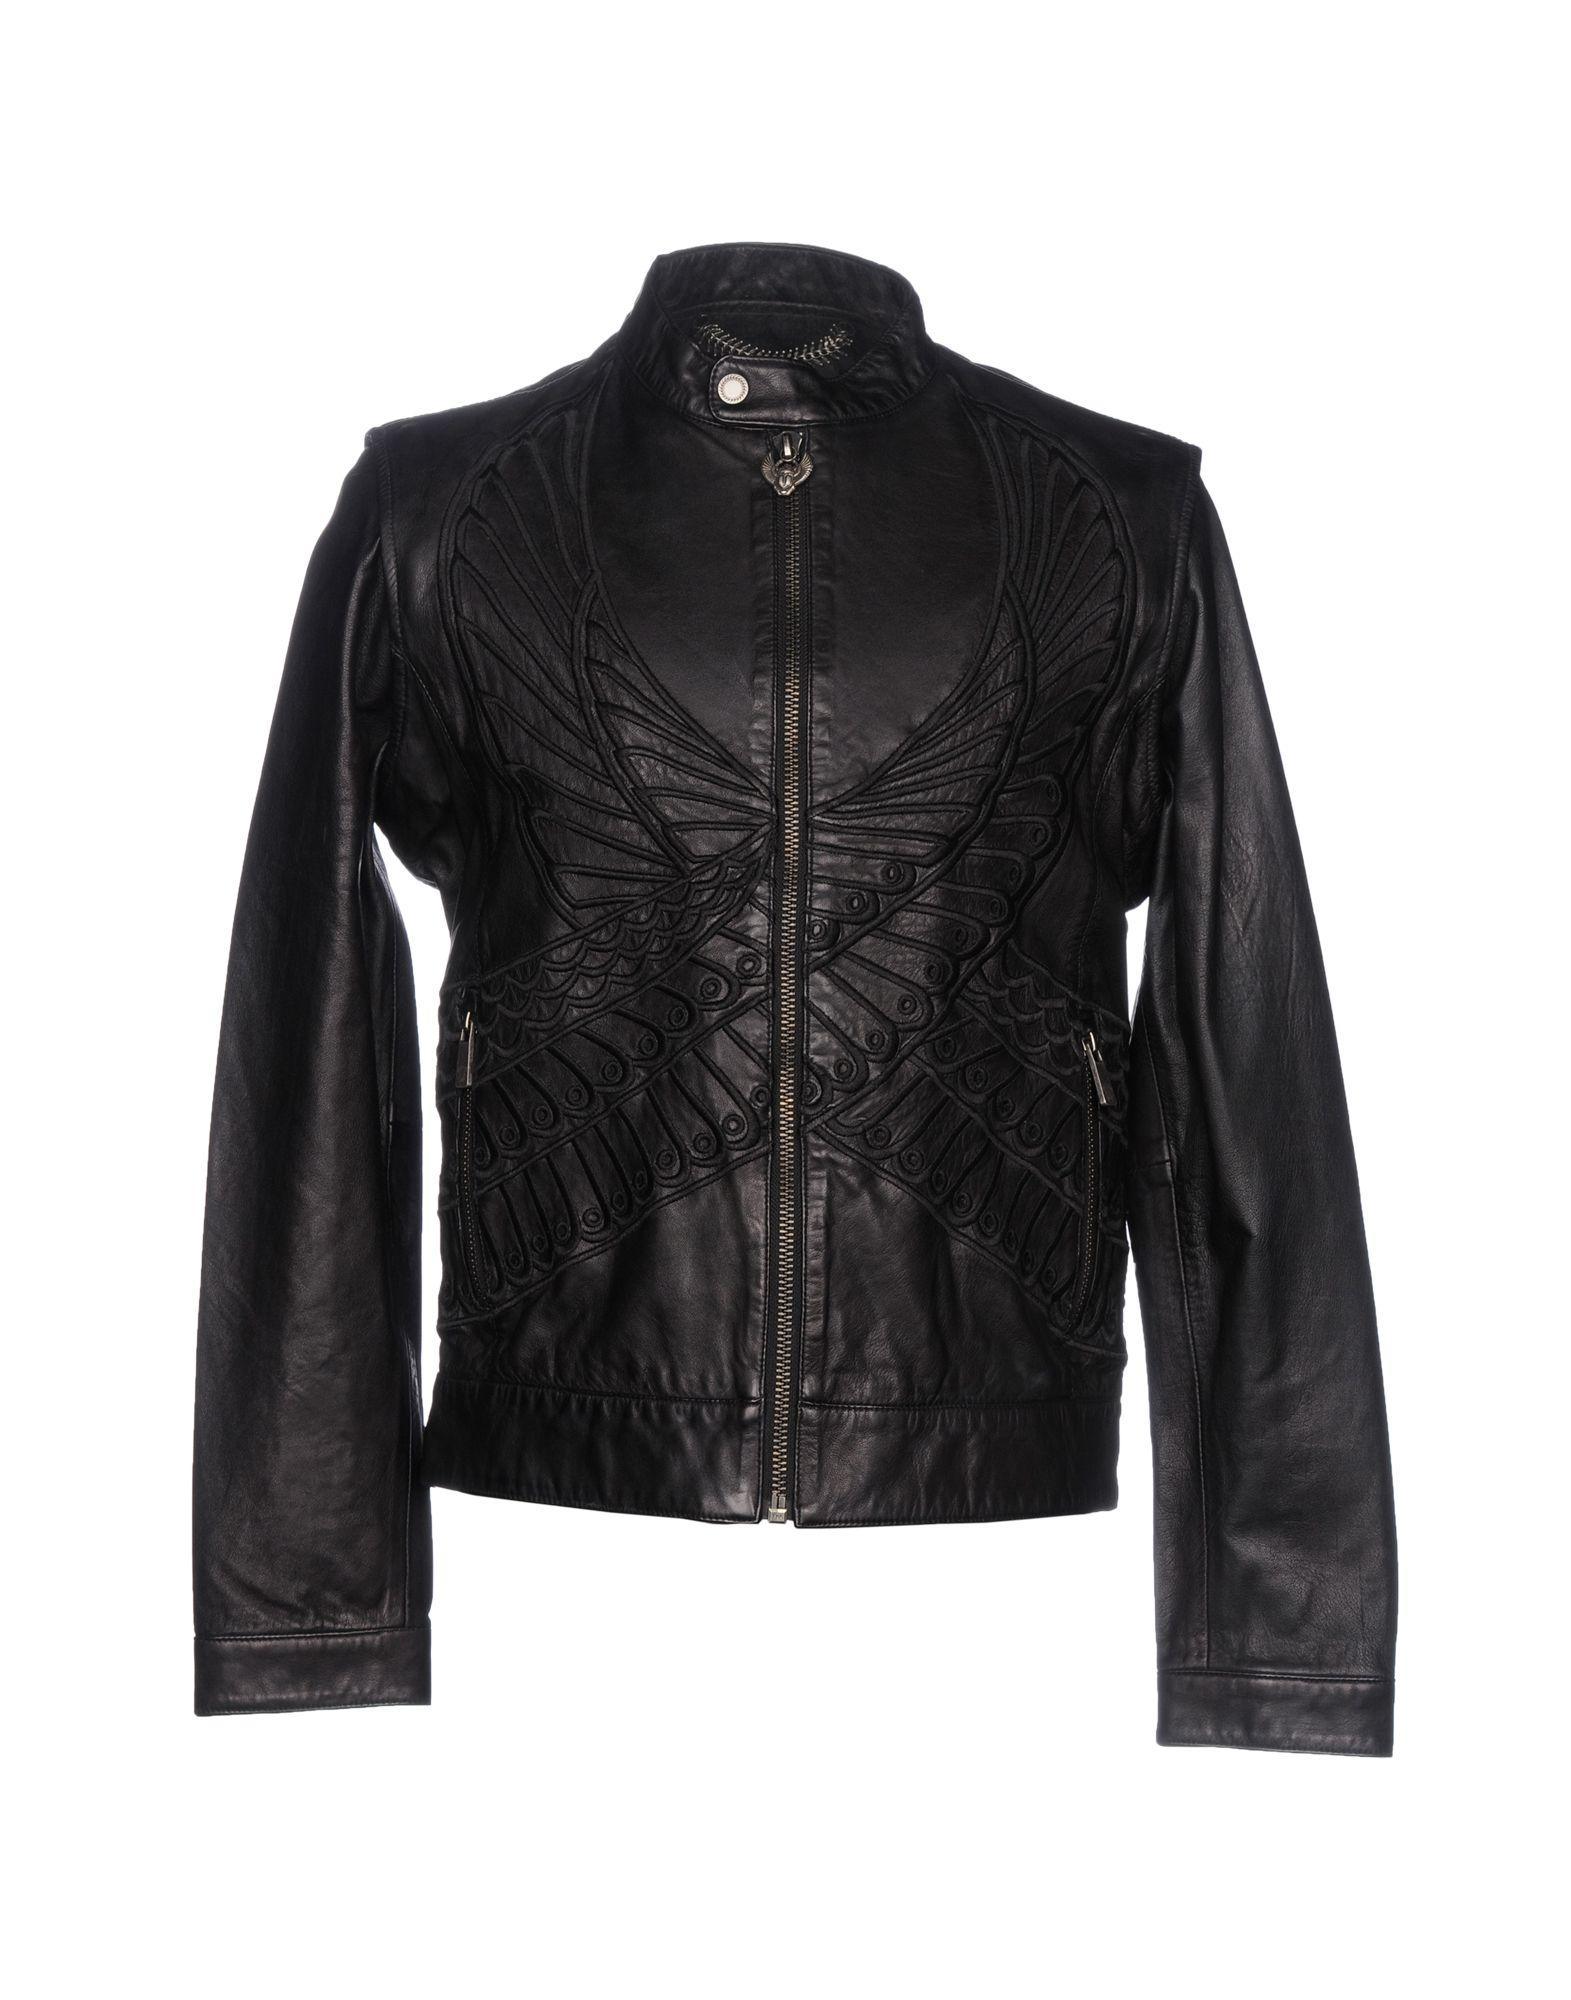 Frankie Morello Jackets In Black